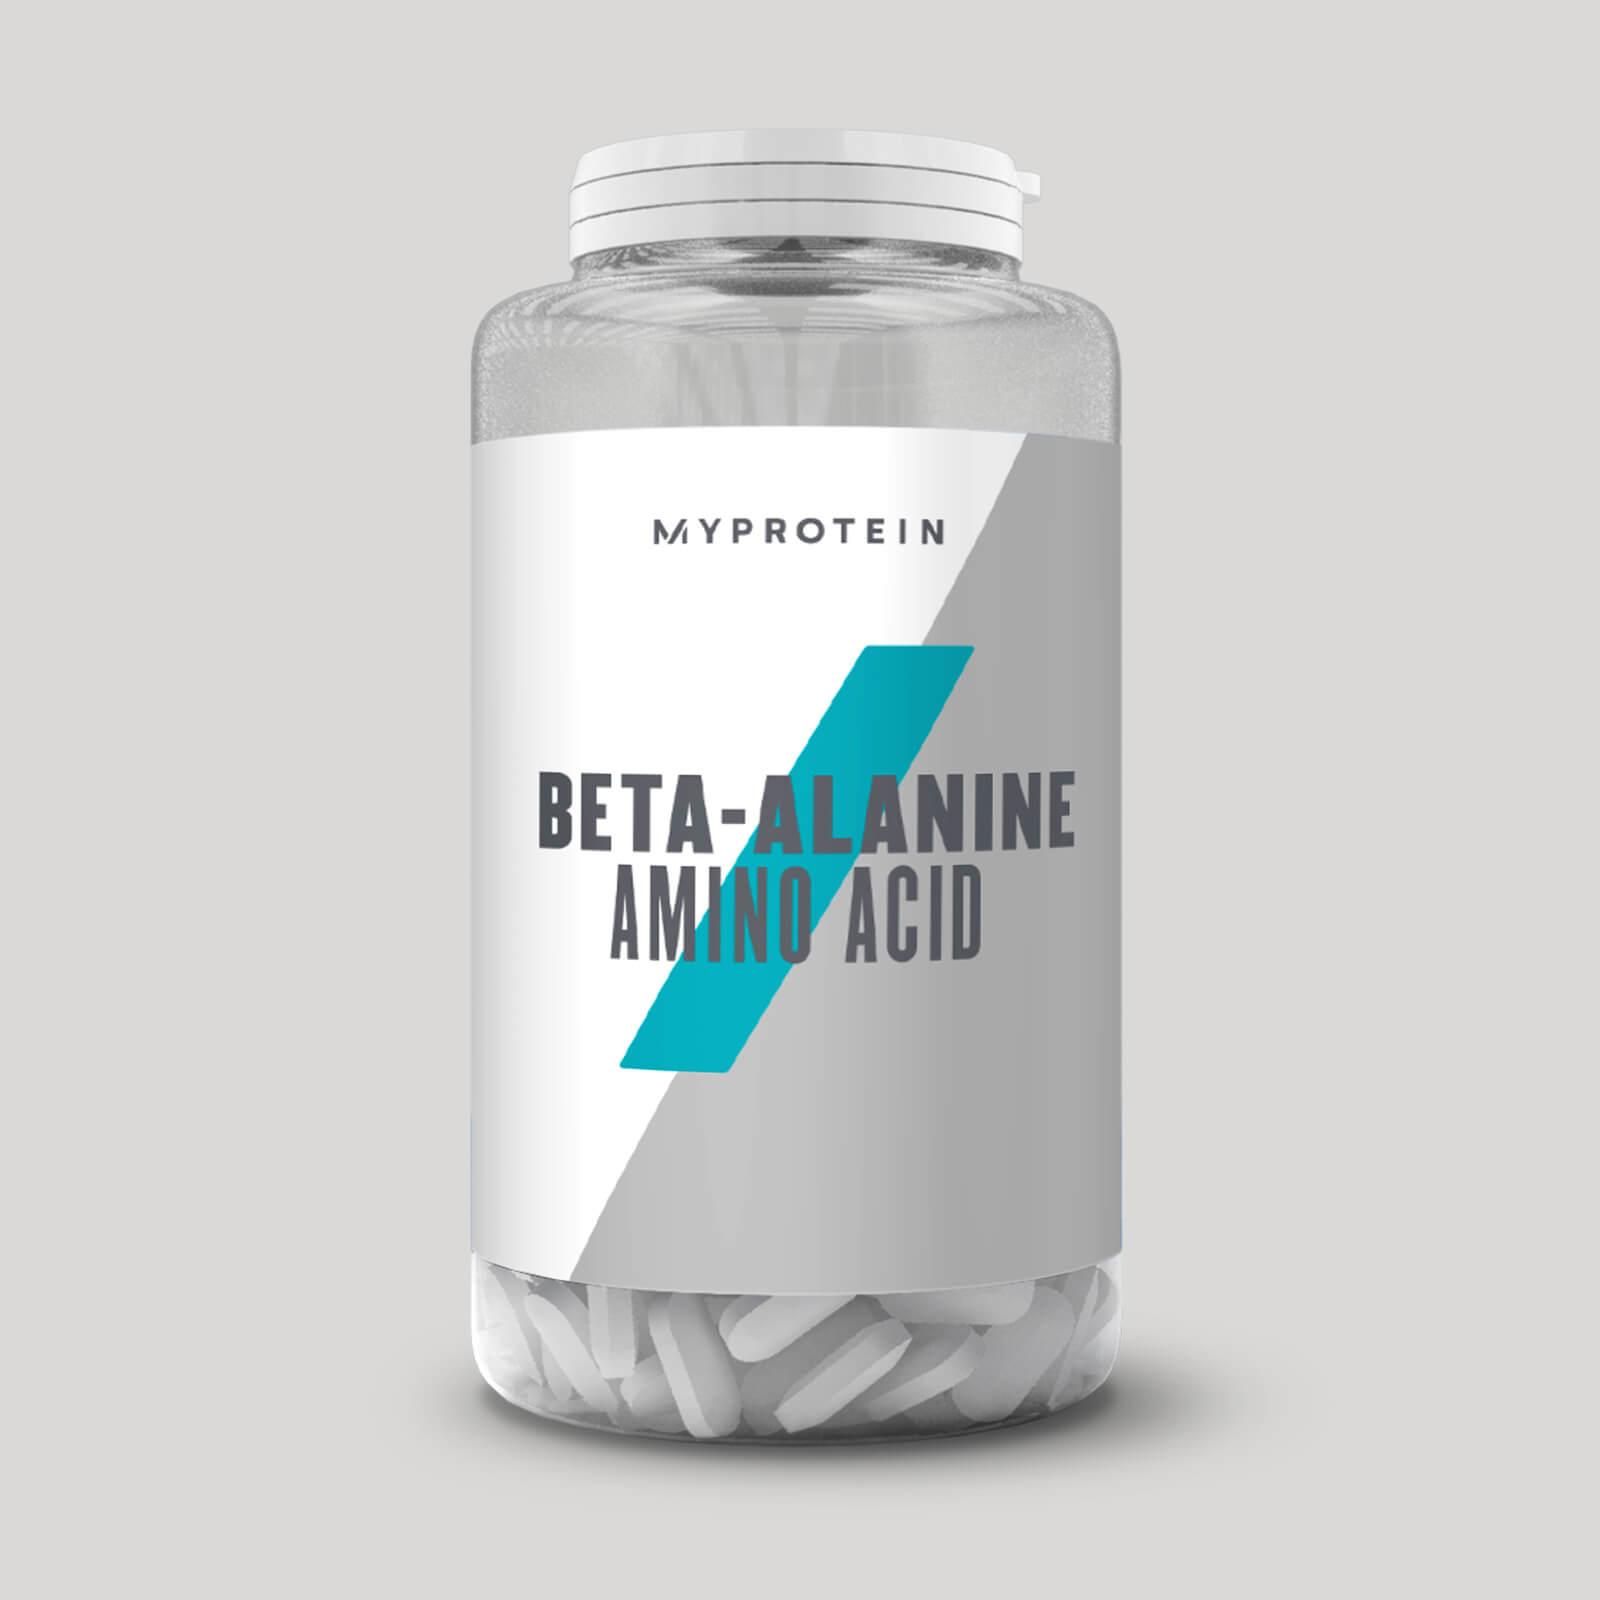 perdita di peso di beta alanina